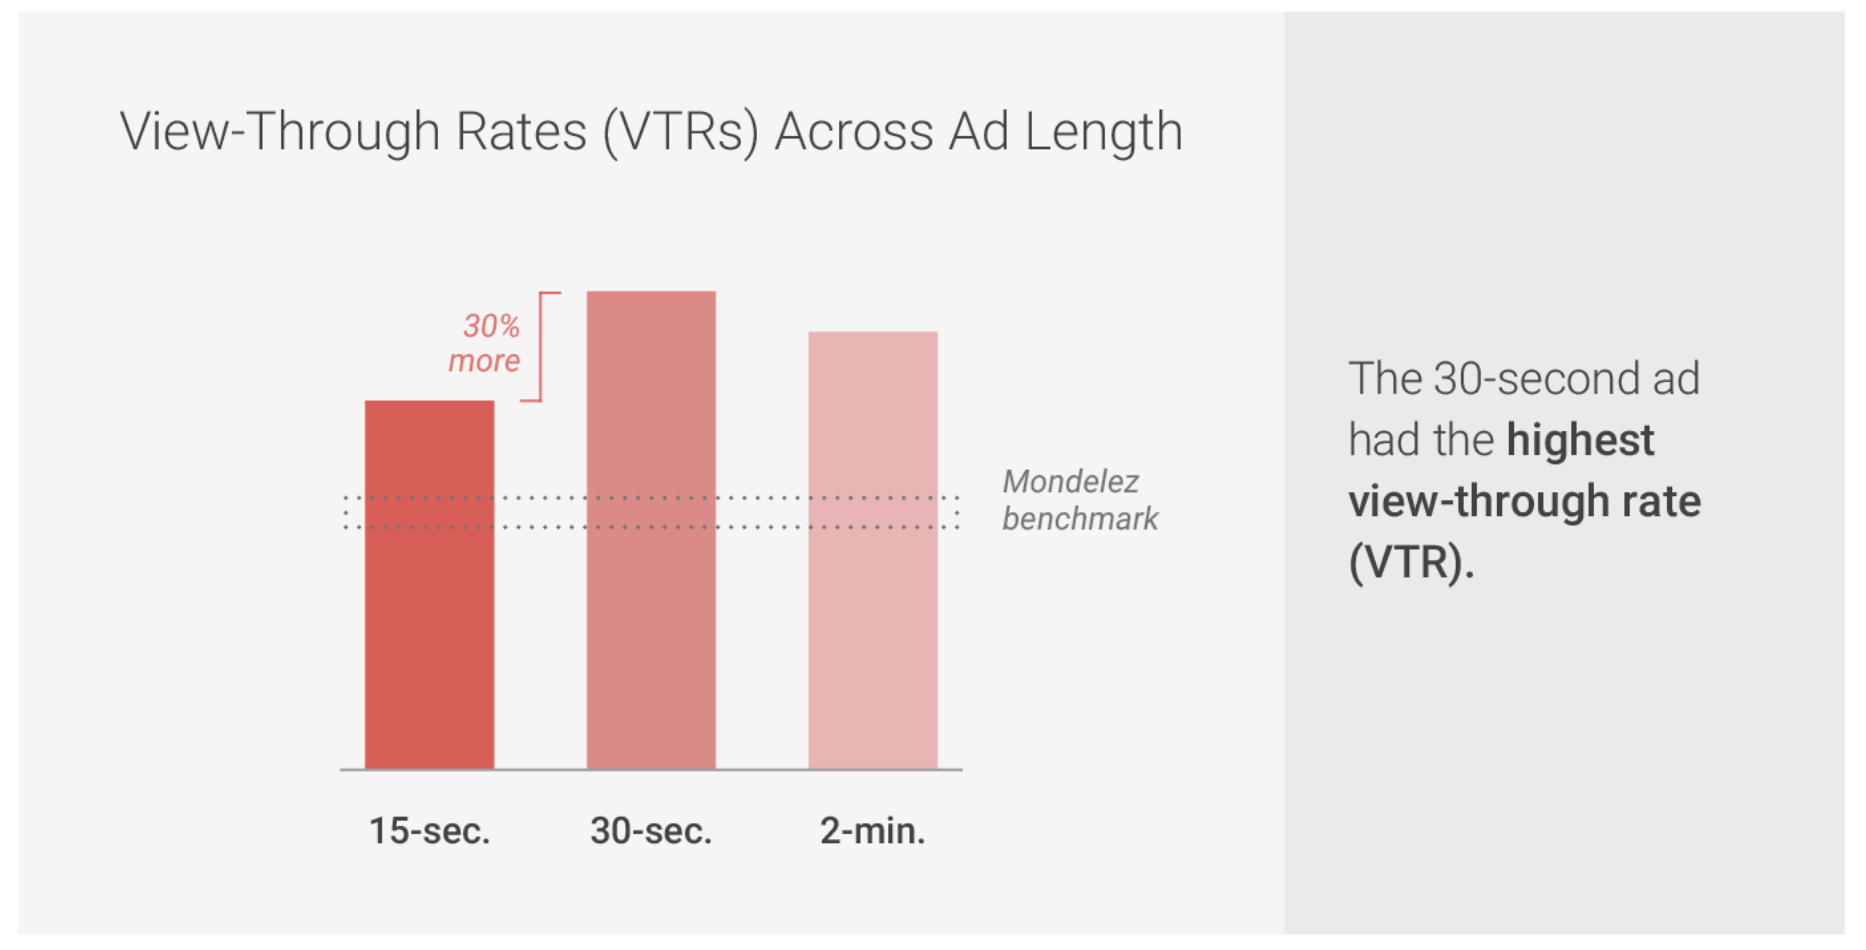 google動画の長さによる視聴時間の差